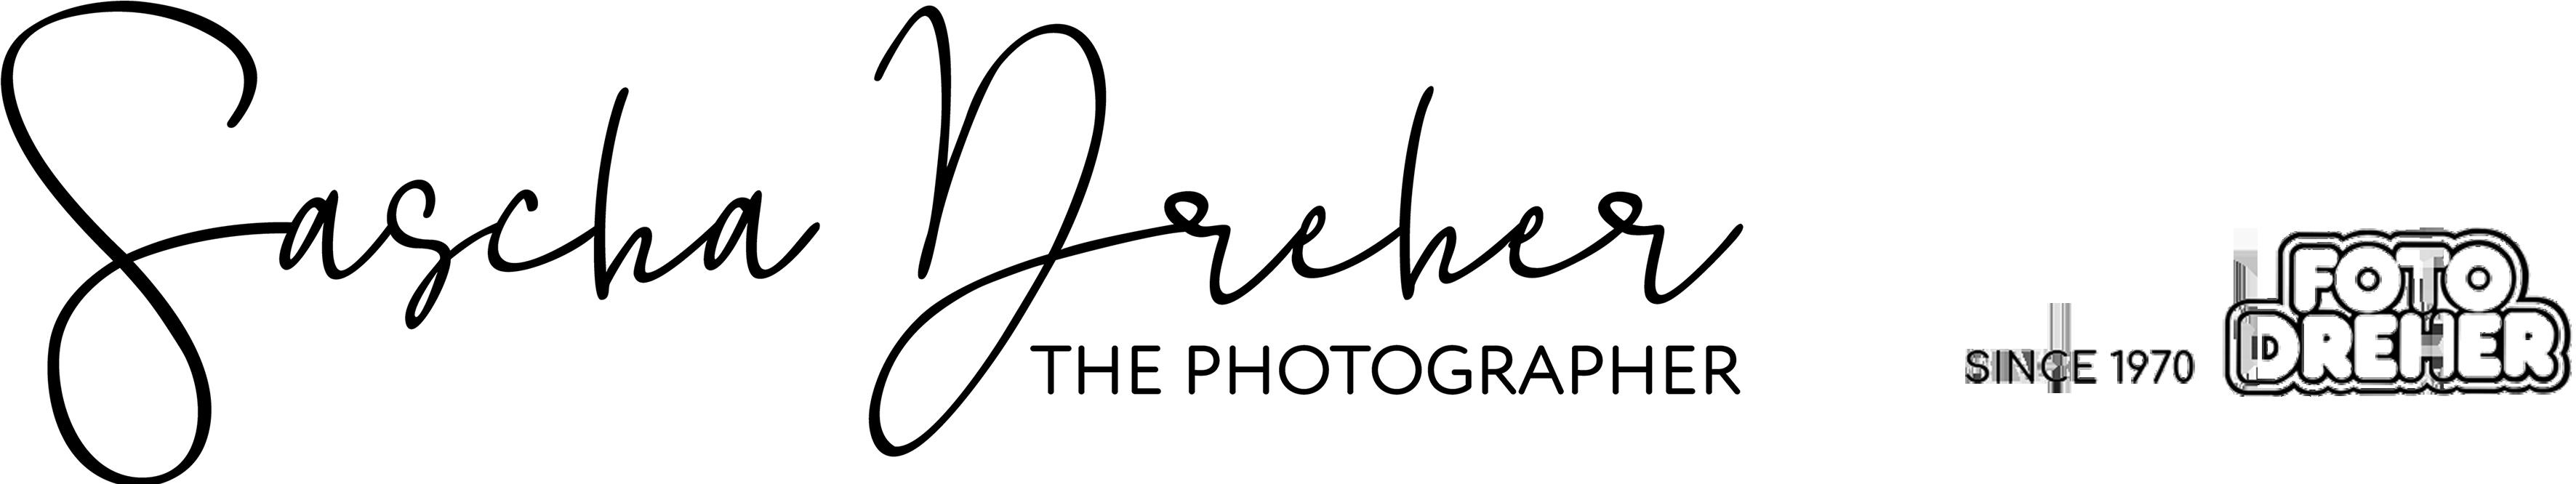 fotodreher